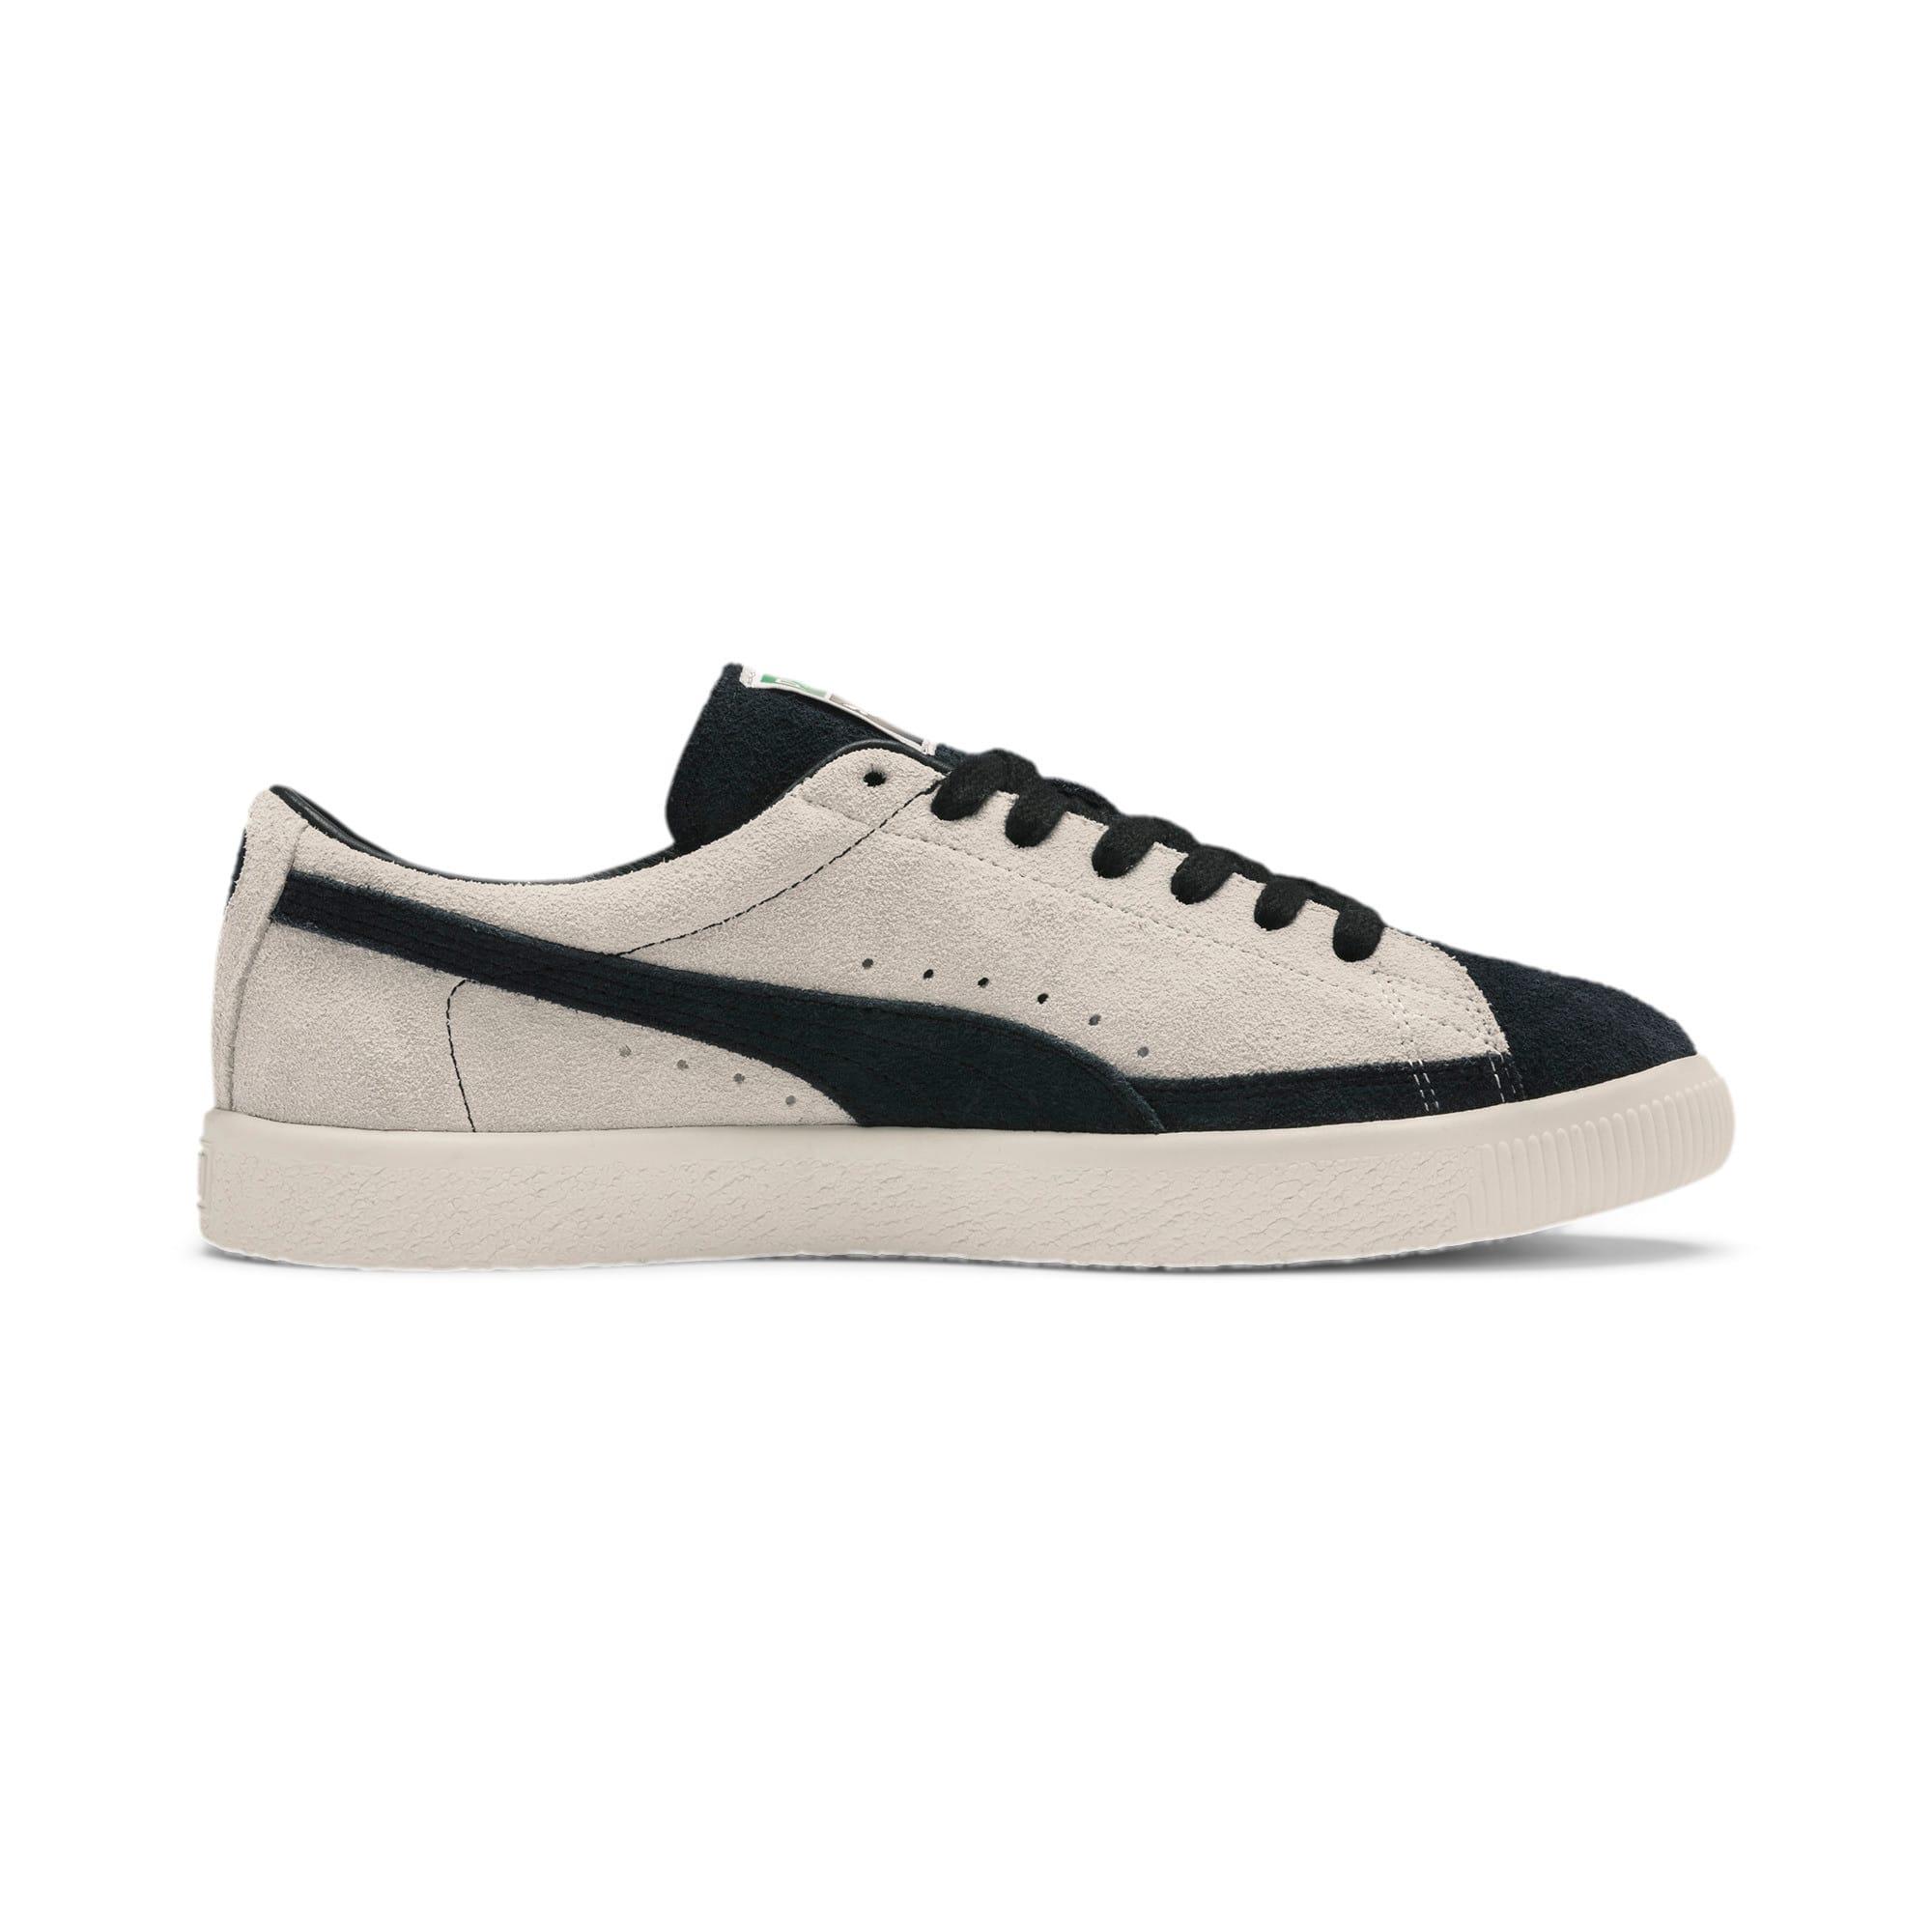 Thumbnail 6 of Suede 90681 Vintage Sneakers, Whisper White-Puma Black, medium